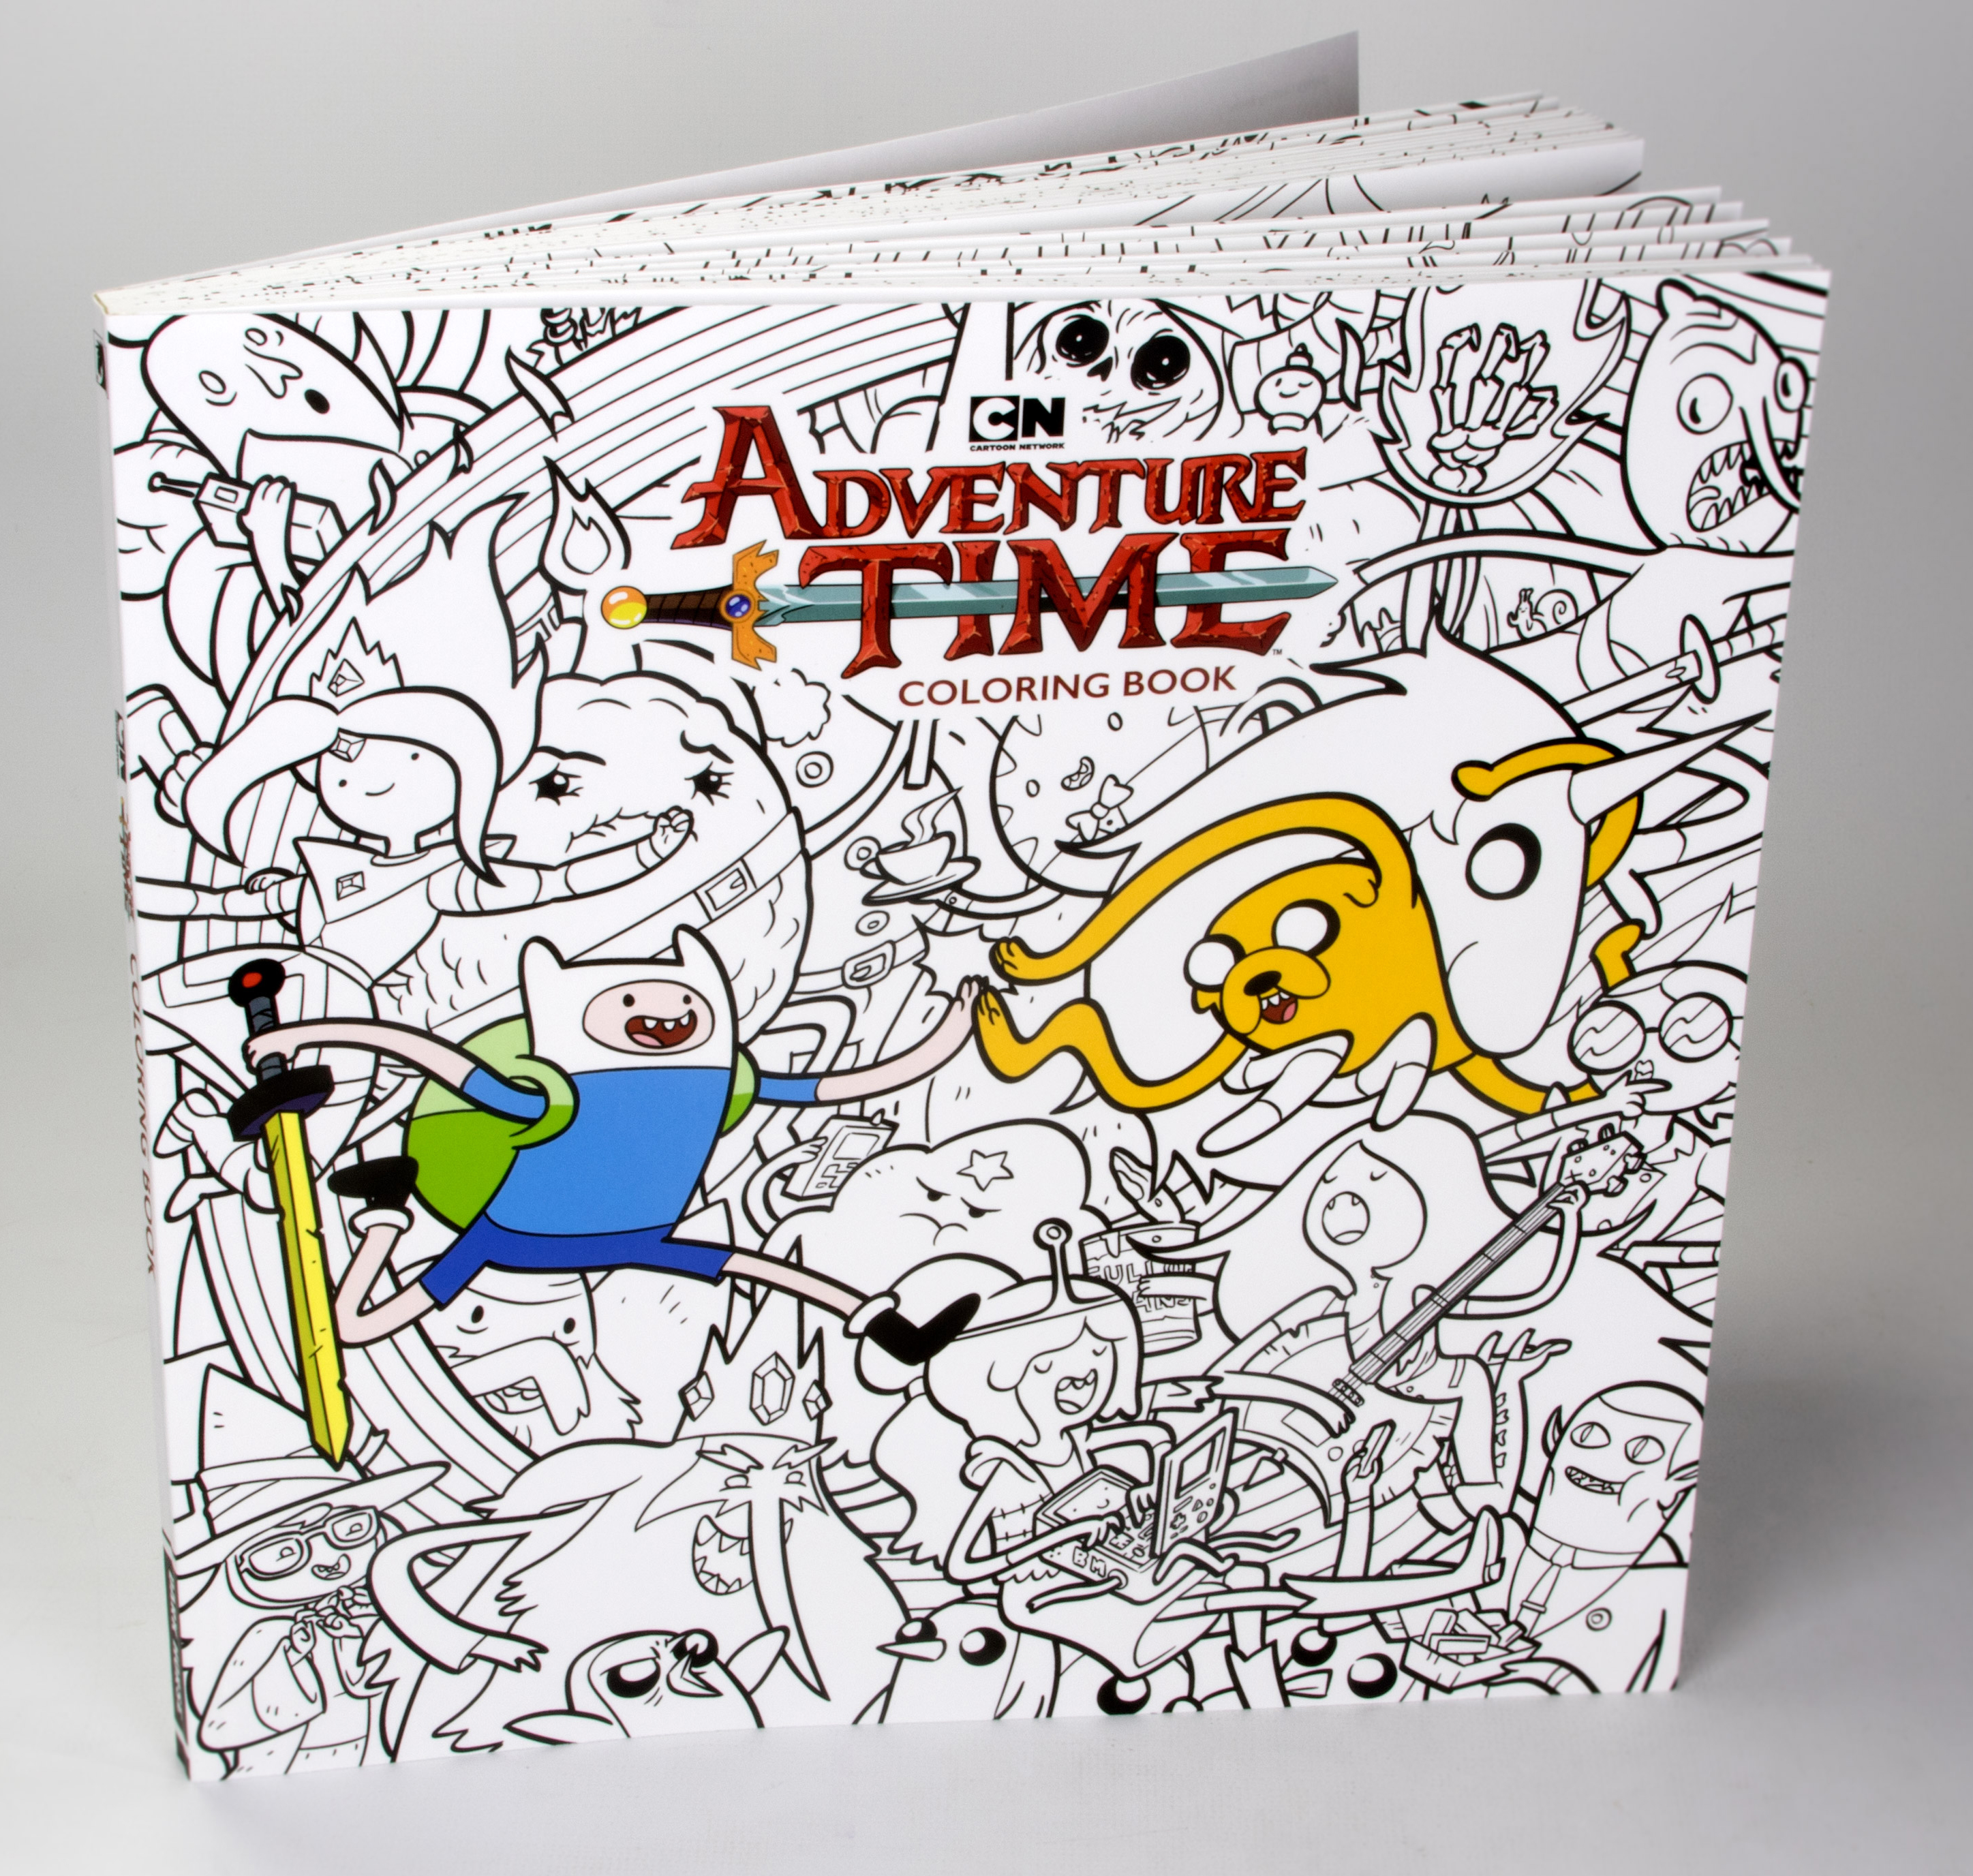 Boom Adventure Time Coloring Book Borg